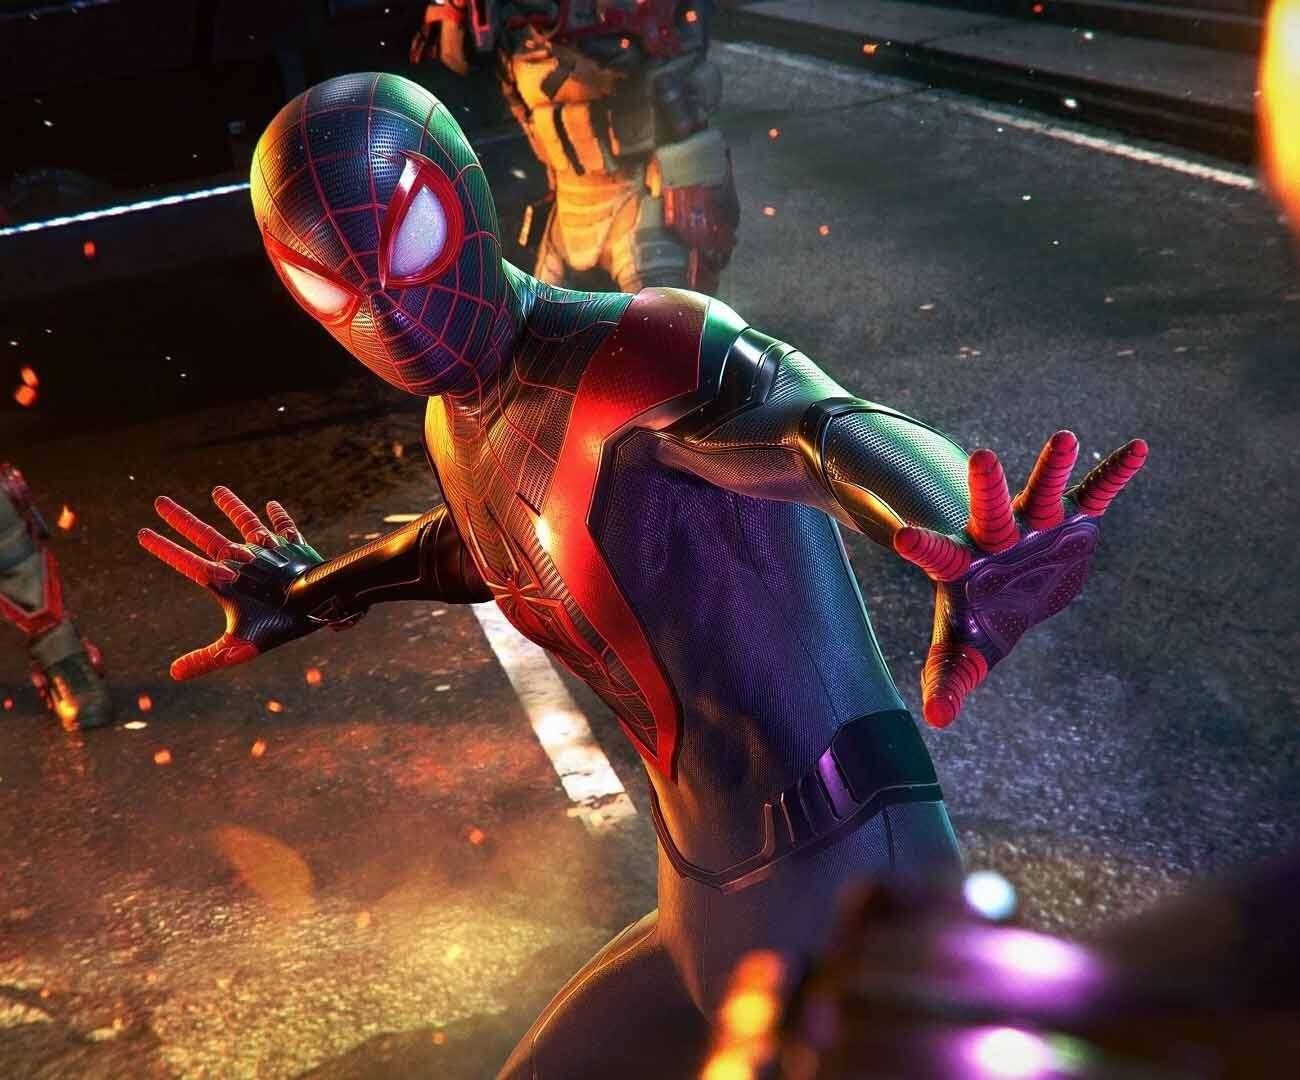 Polski dubbing Spider-Man Miles Morales na zwiastunie! Ale kot mówi po swojemu